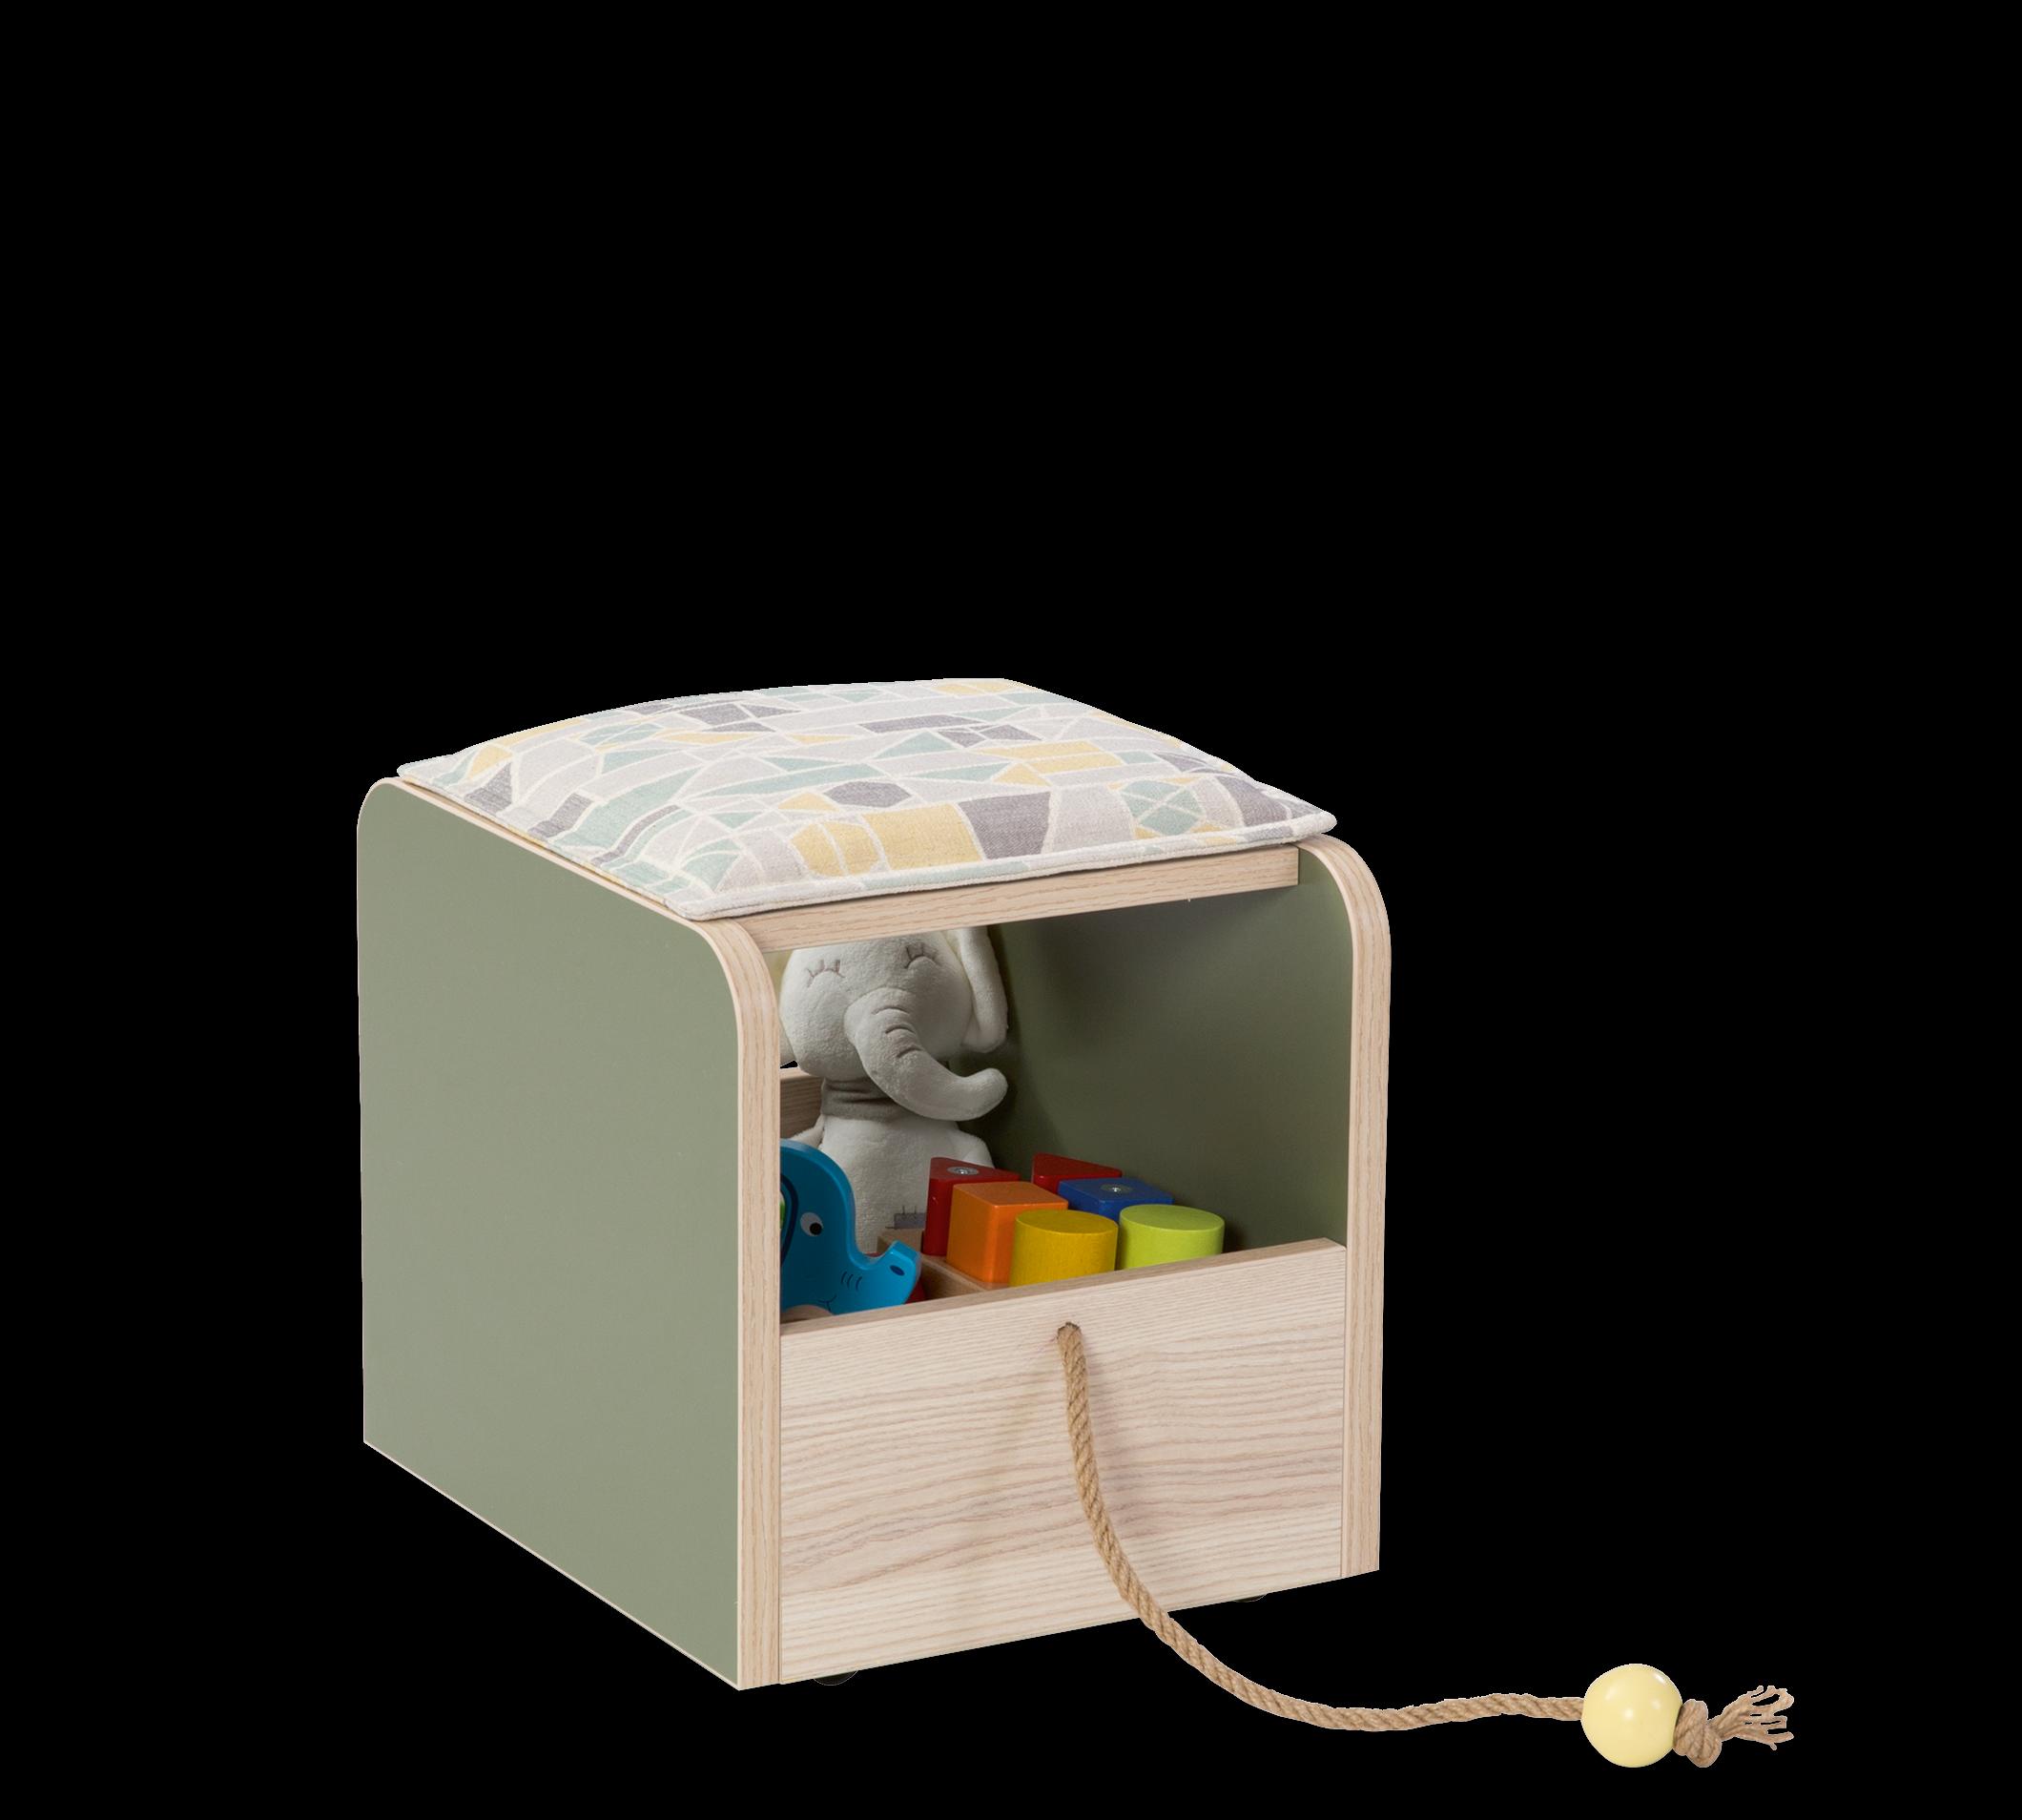 Taburet din pal, cu spatiu de depozitare pentru copii Montessori Verde / Natural, l29xA40xH34 cm somproduct.ro